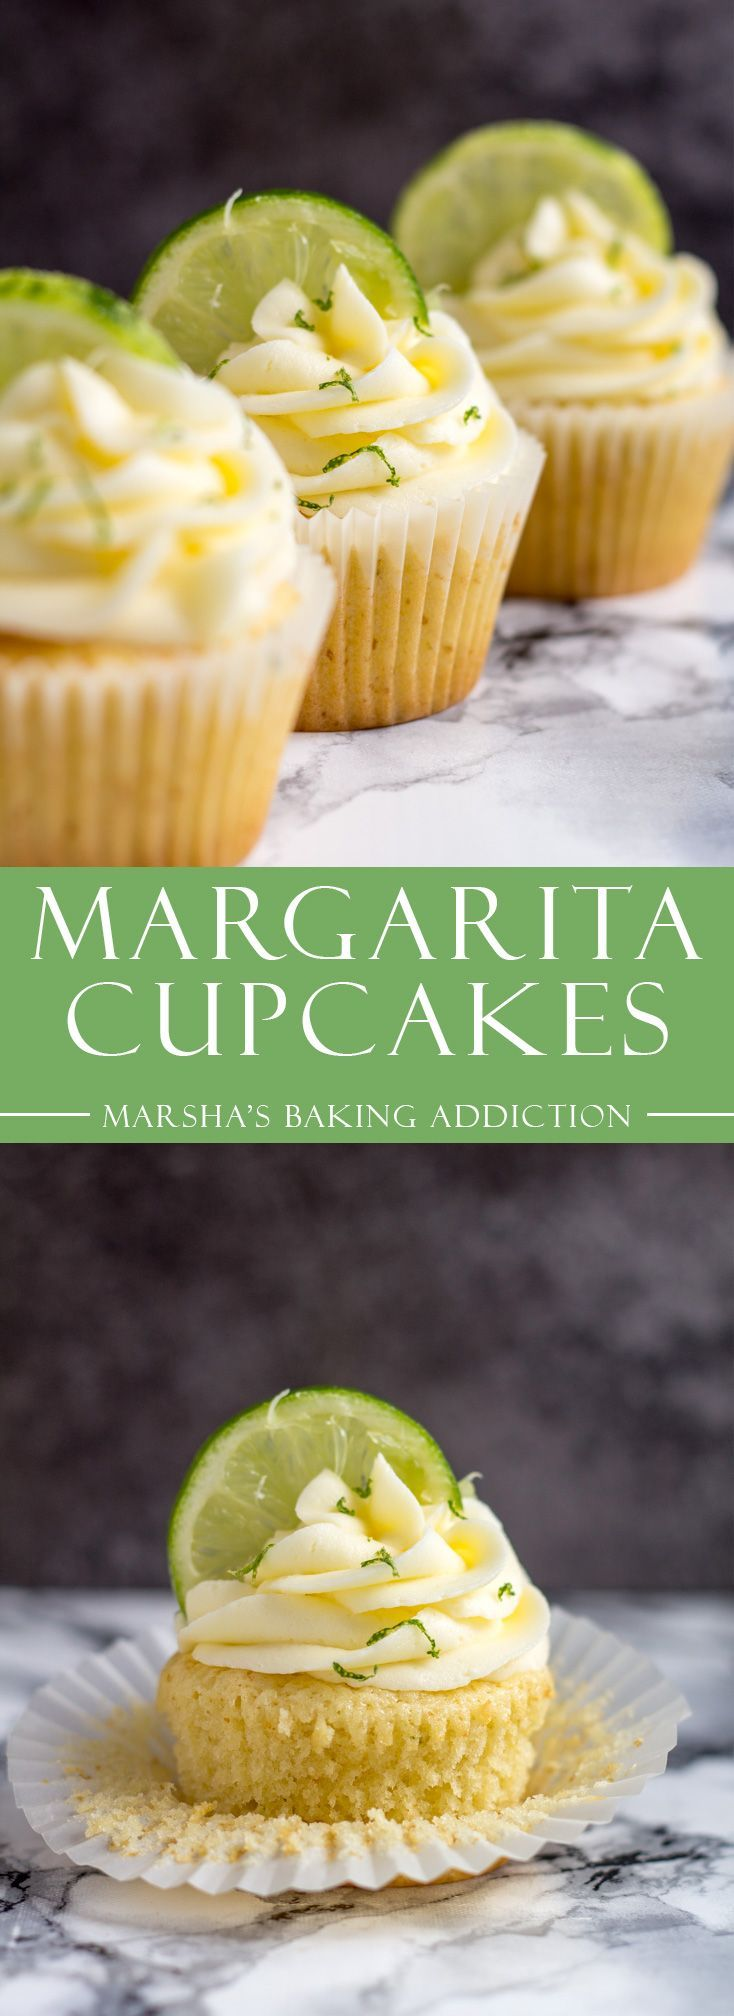 Margarita Cupcakes | marshasbakingaddiction.com @marshasbakeblog